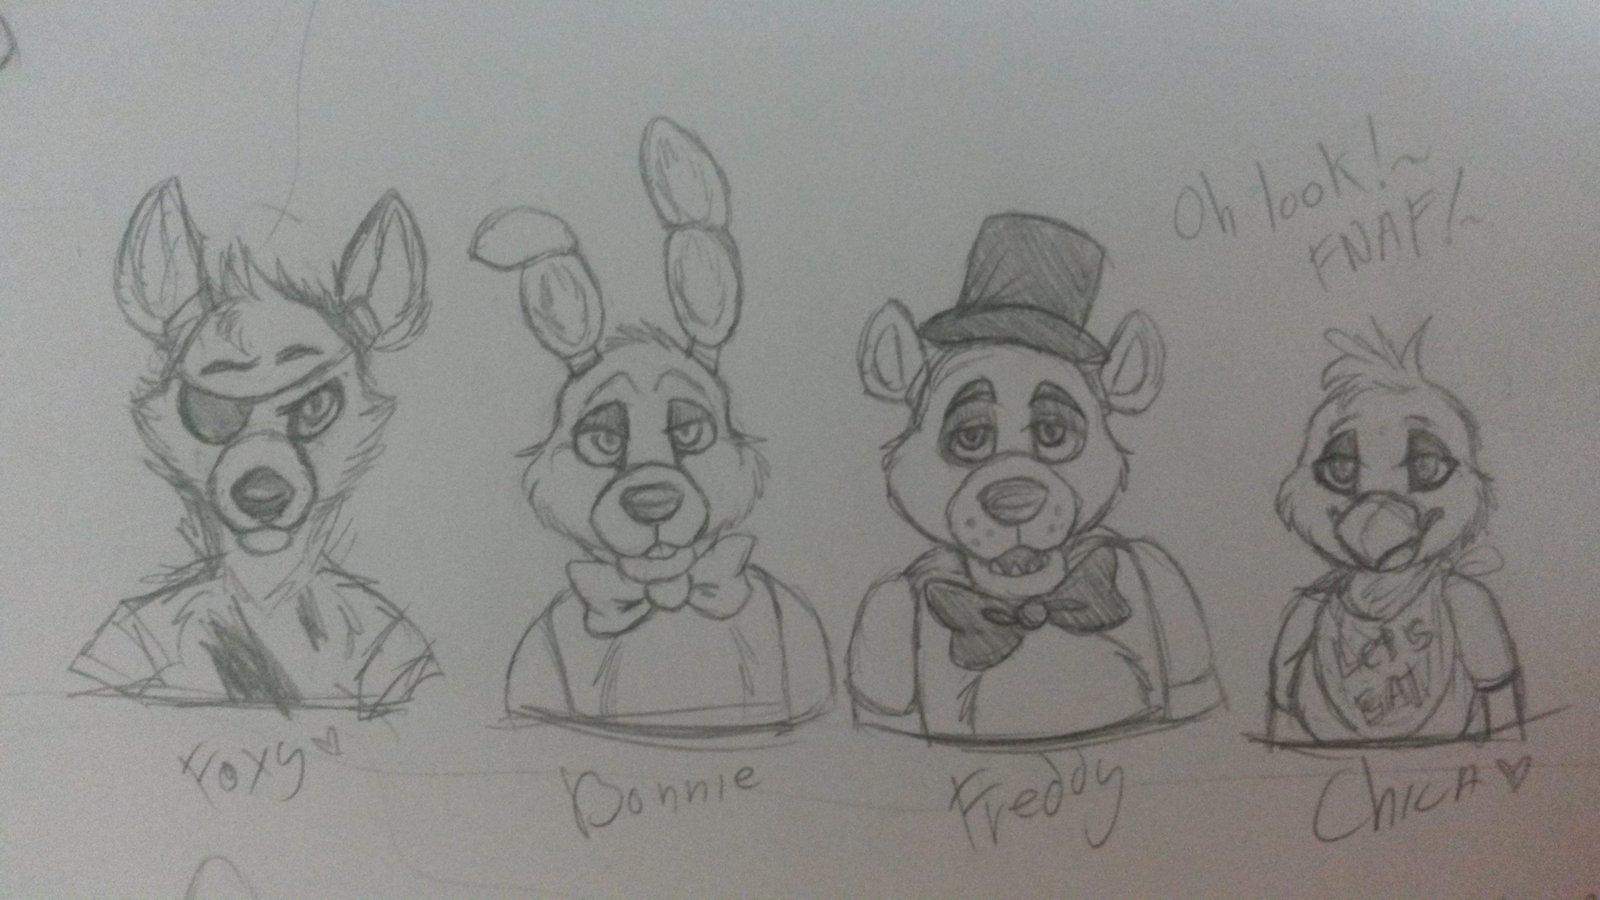 Картинки персонажей фнаф для срисовки